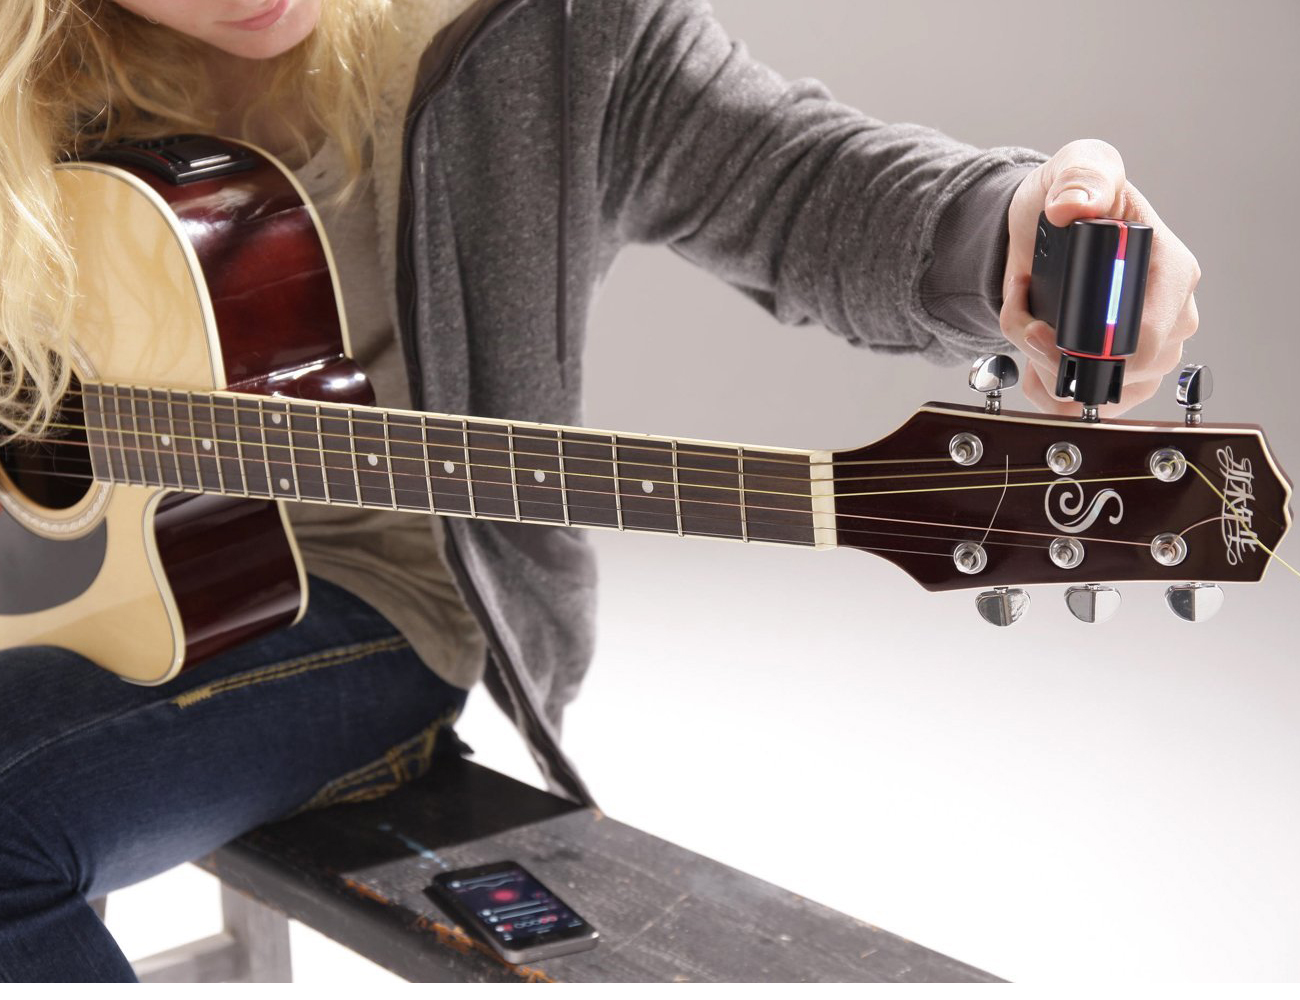 Roadie Tuner – Automatic Guitar Tuner